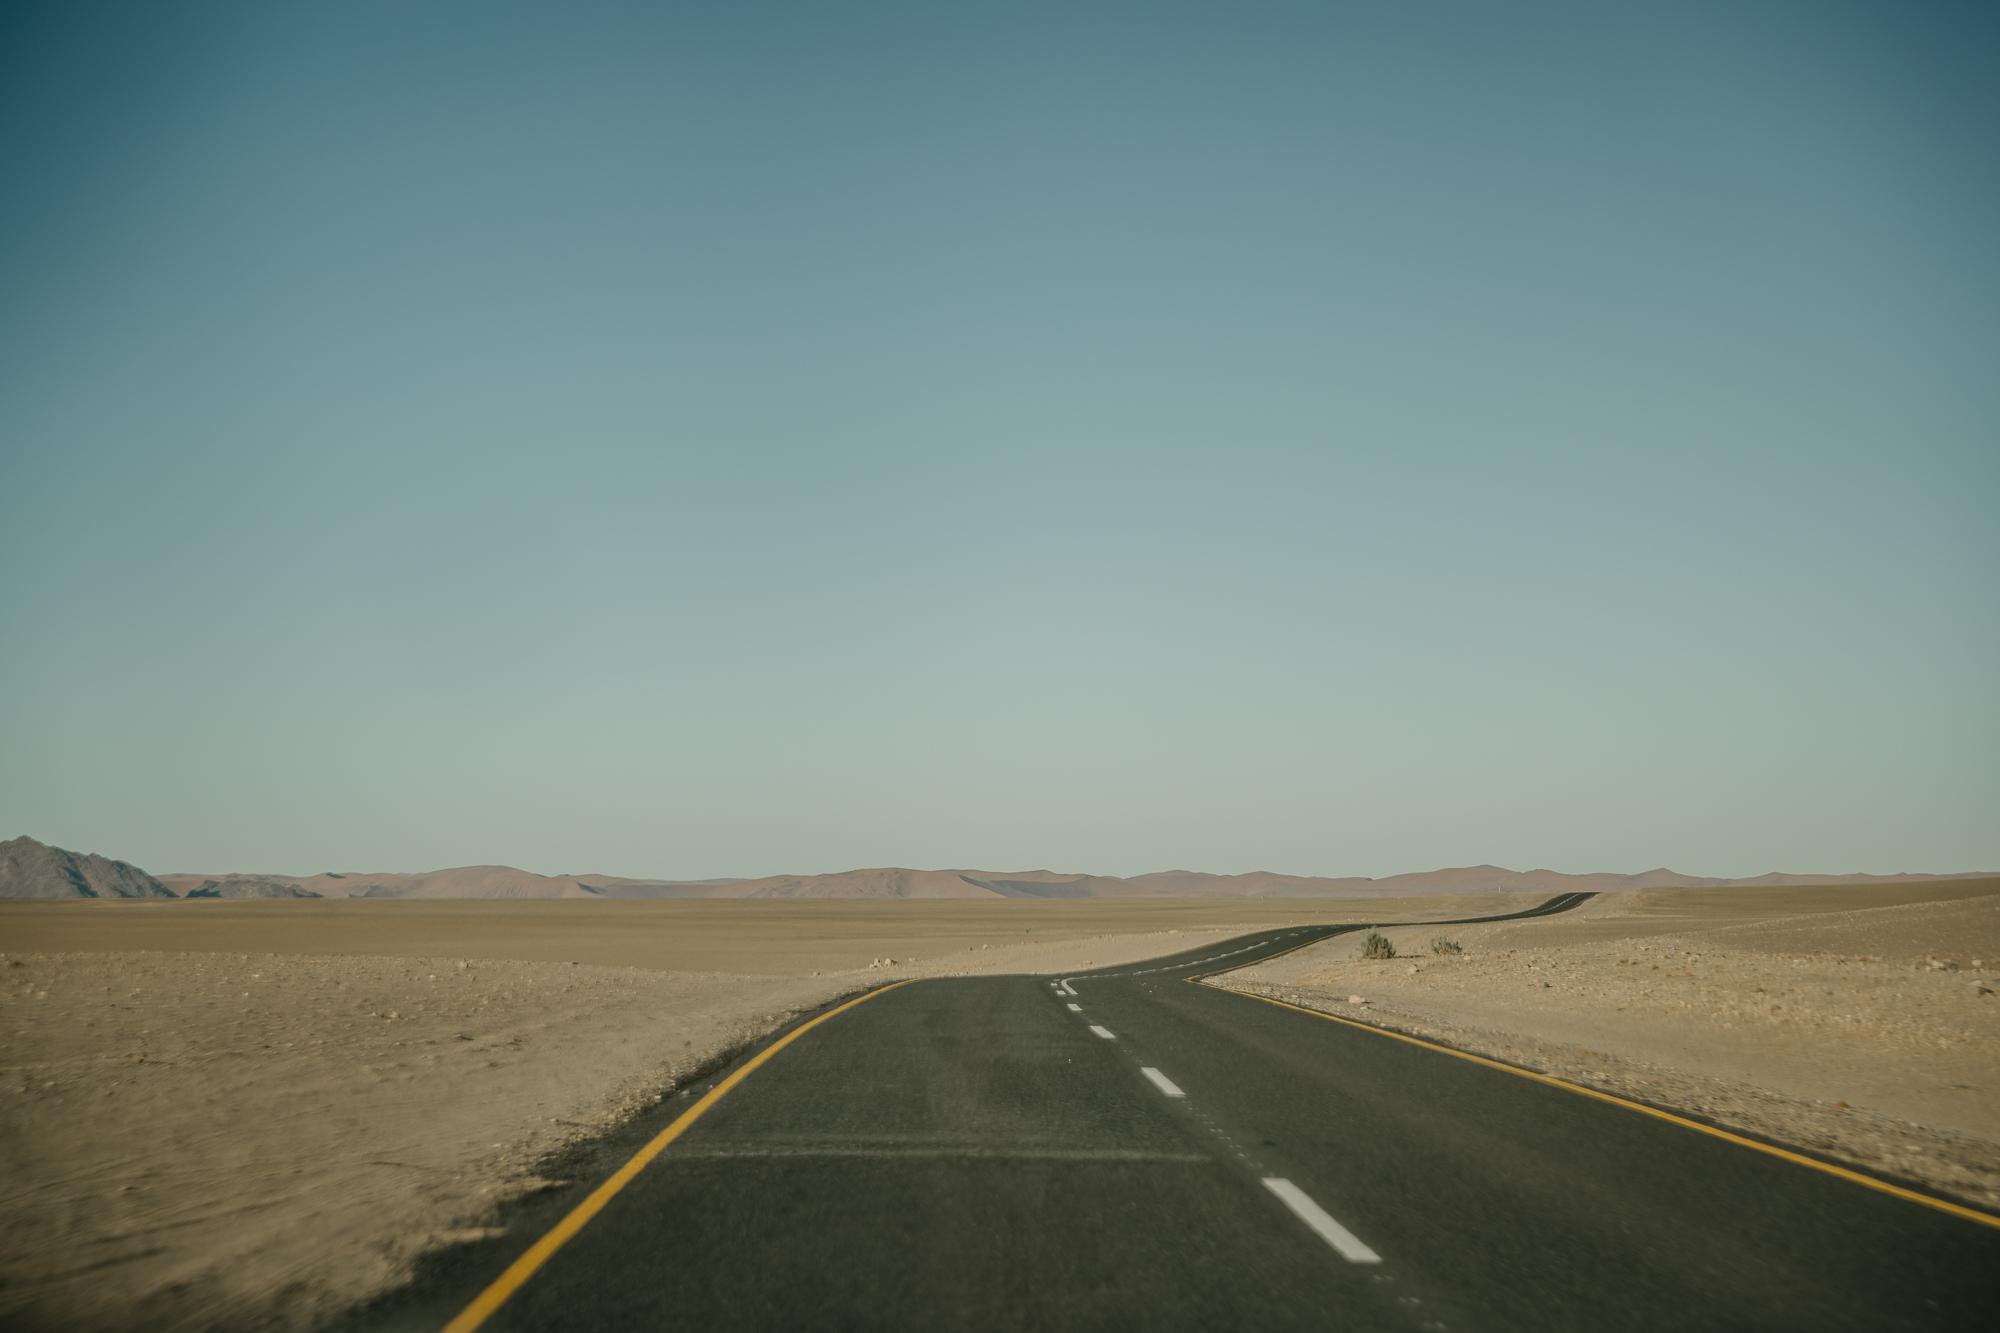 061718_NAMIBIA-pDay4_camF_0099.jpg